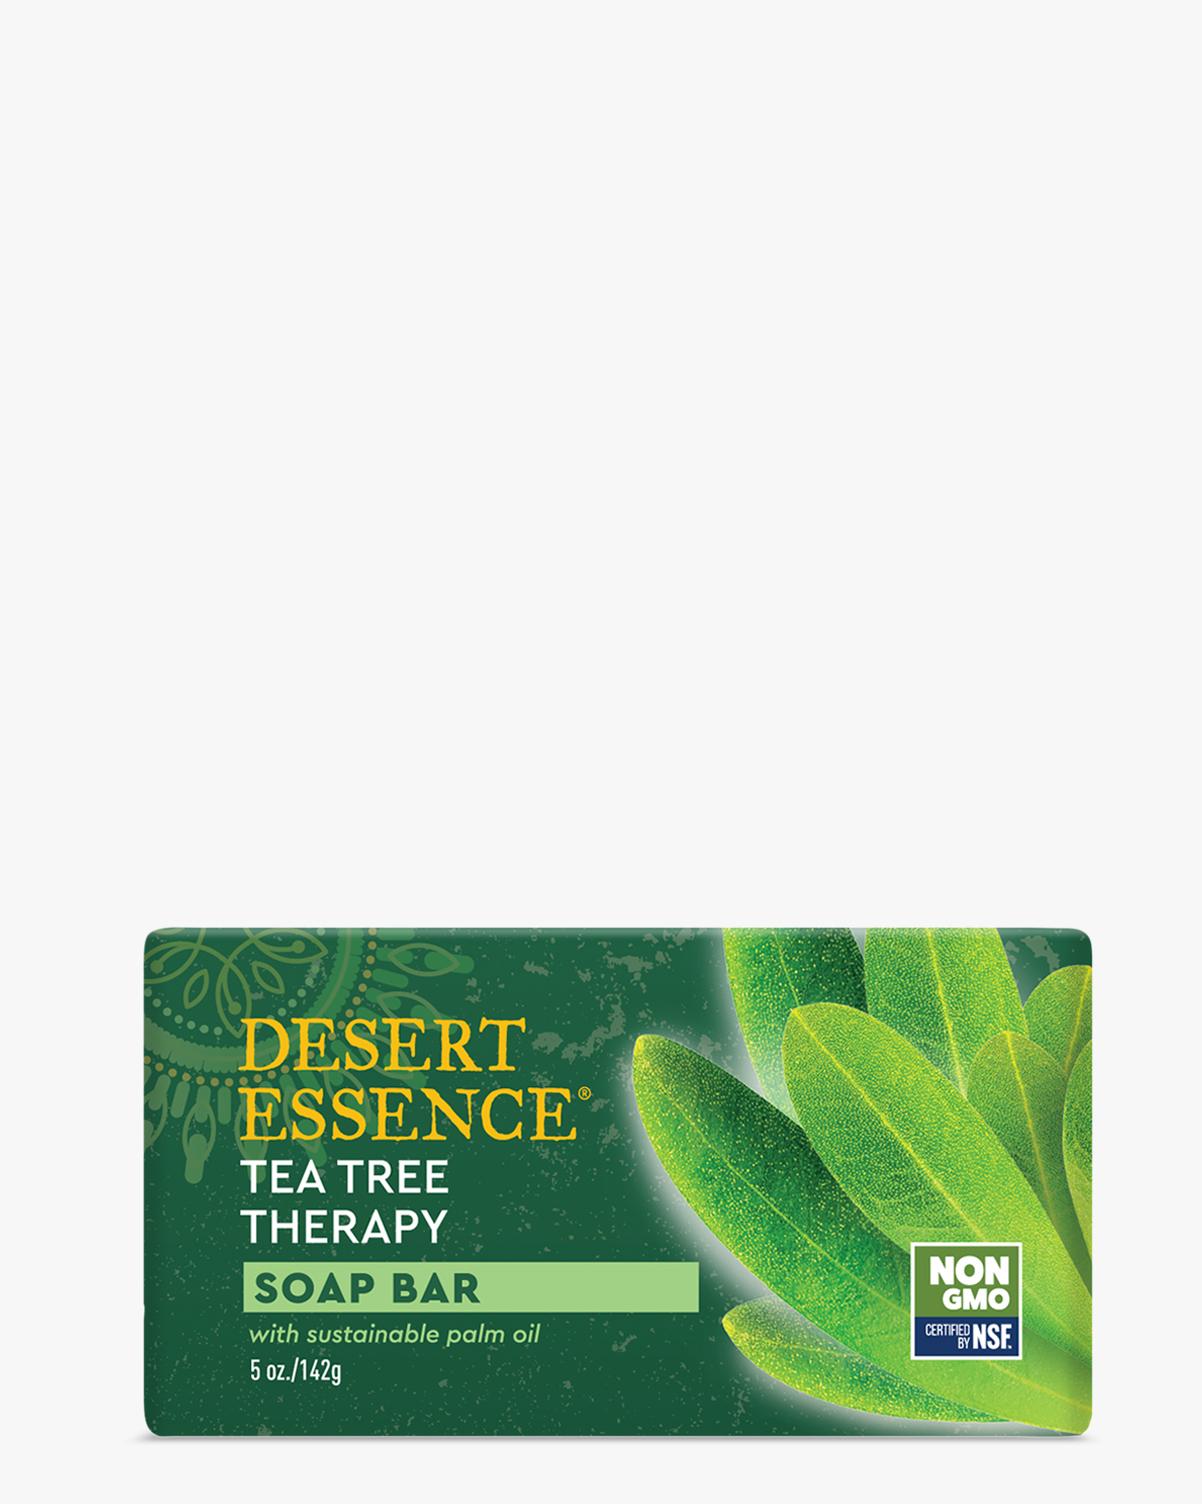 Desert Essence coupon: Desert Essence Tea Tree Oil Therapy Cleansing Soap Bar, 5 oz. | Vegan | Gluten-Free